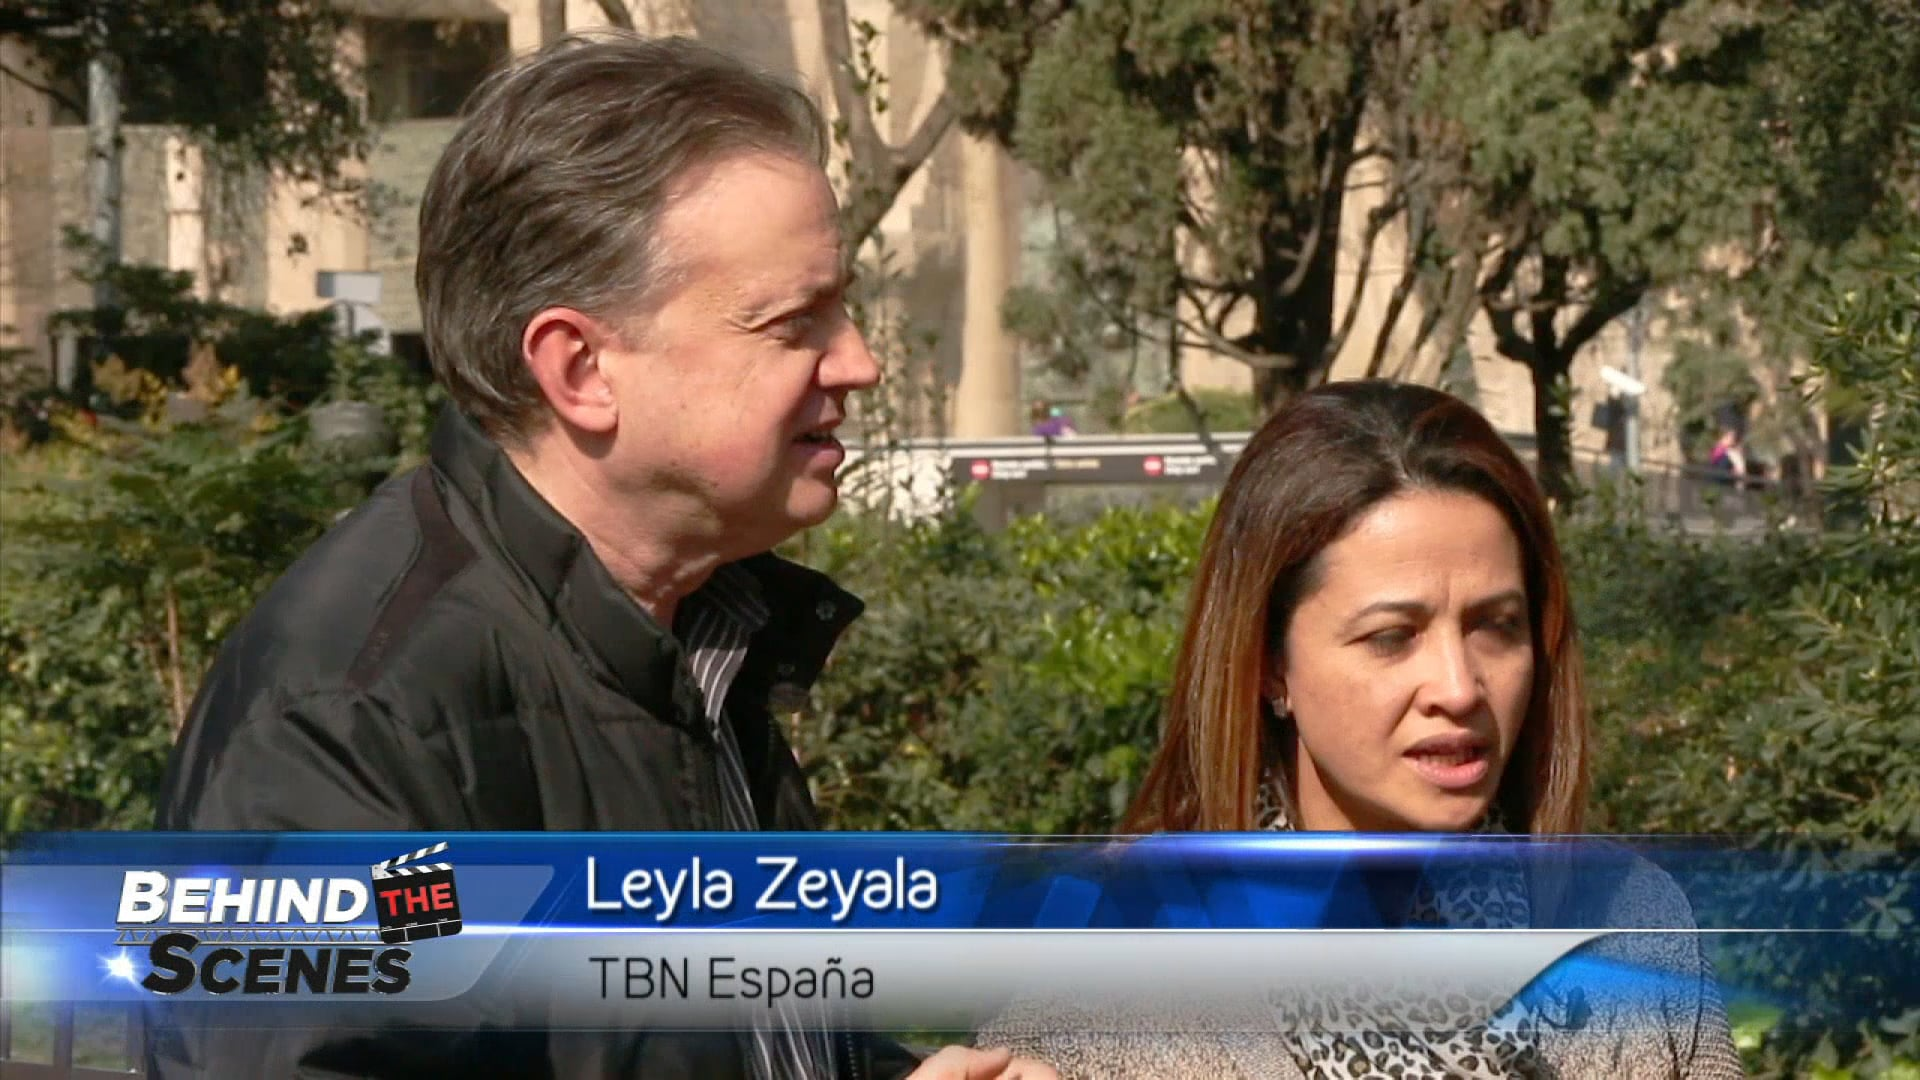 Matt & Laurie Crouch hosts Pablo Vazquez and Leyla Zeyala from Barcelona, Spain